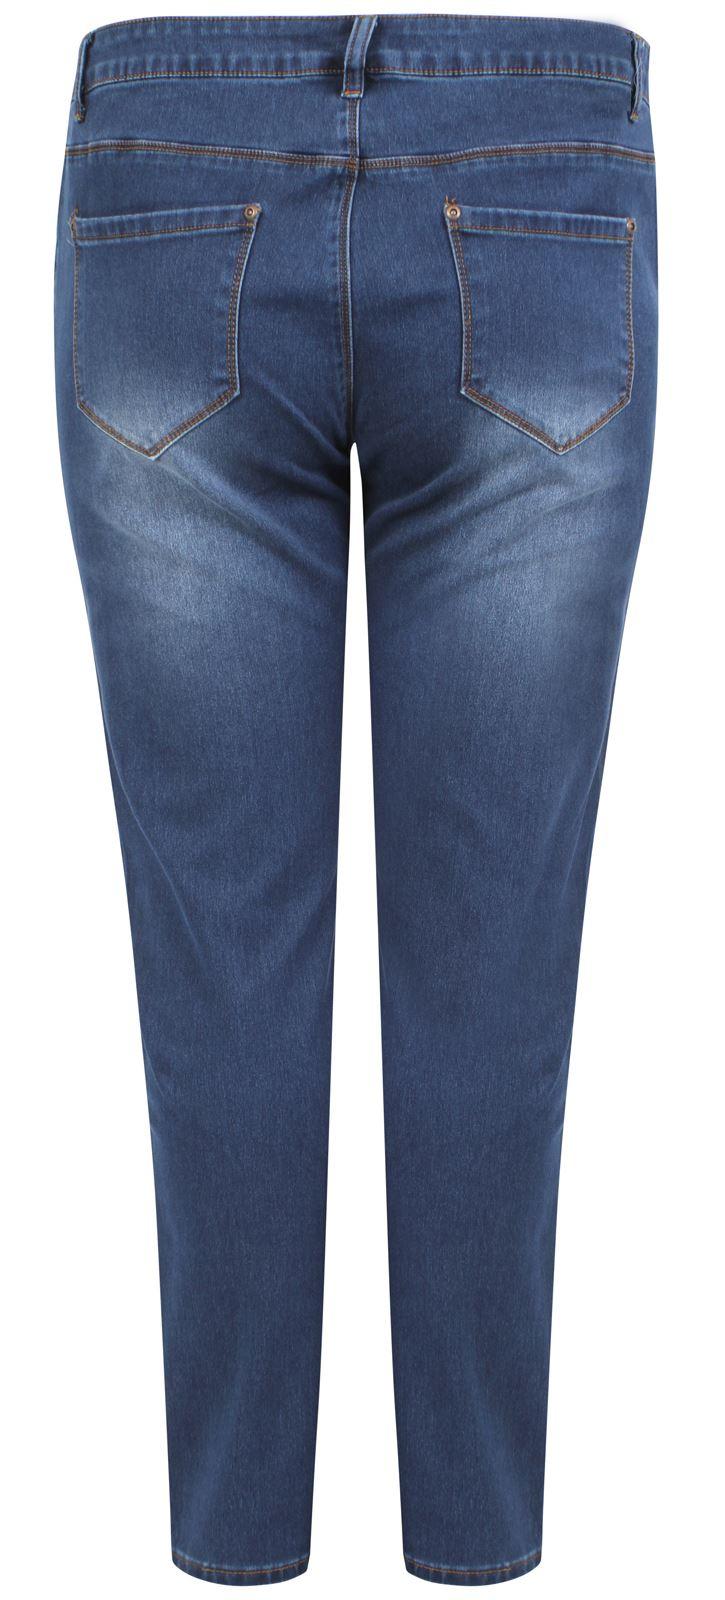 damen bergr e doppelten naht enganliegend denim jeans. Black Bedroom Furniture Sets. Home Design Ideas